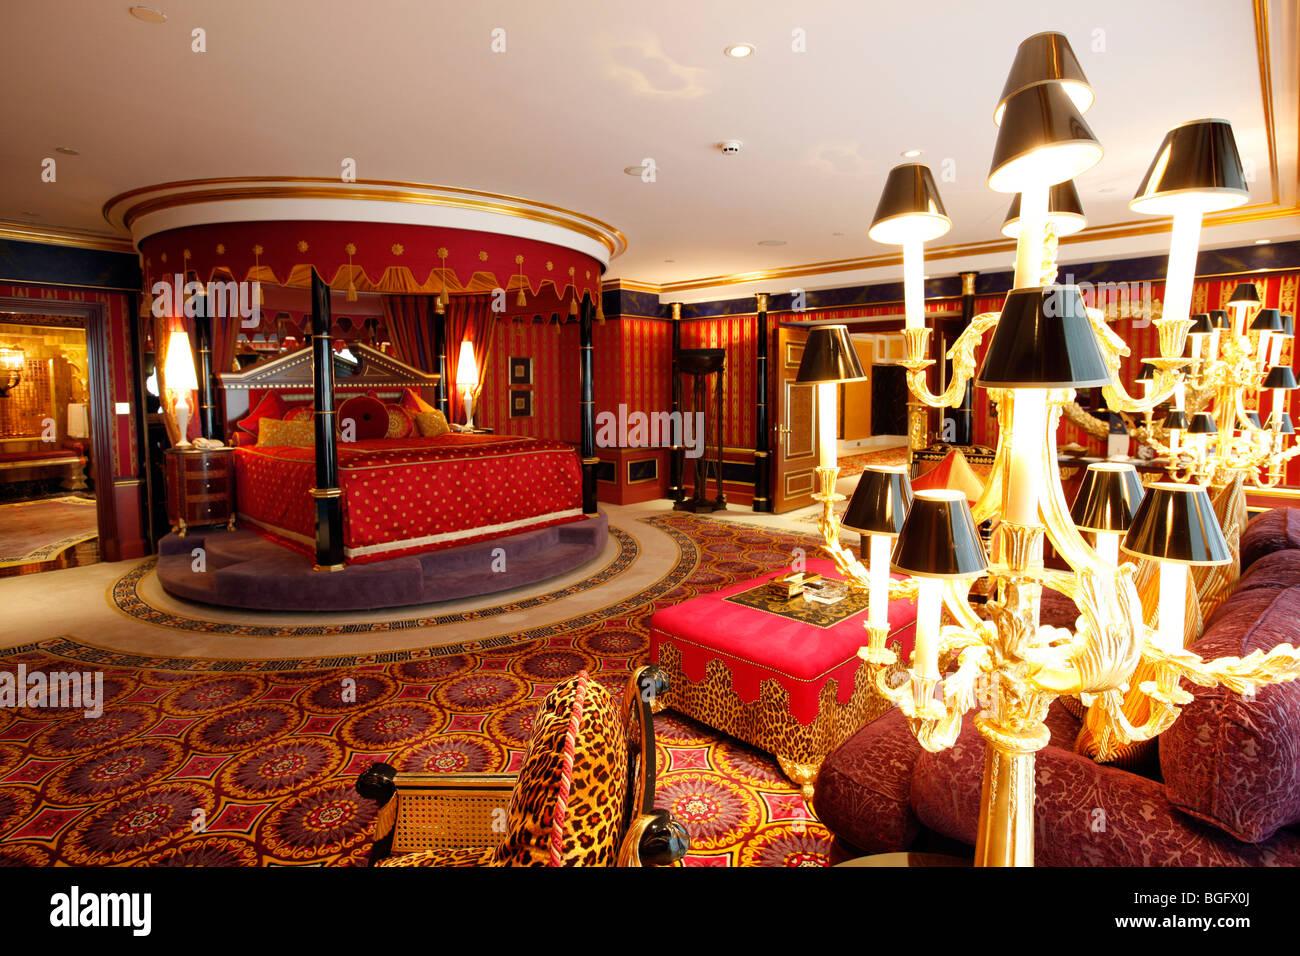 presidential suite, deluxe suite, sleeping room in the Burj Al Arab, Dubai, united Arabian emirates - Stock Image